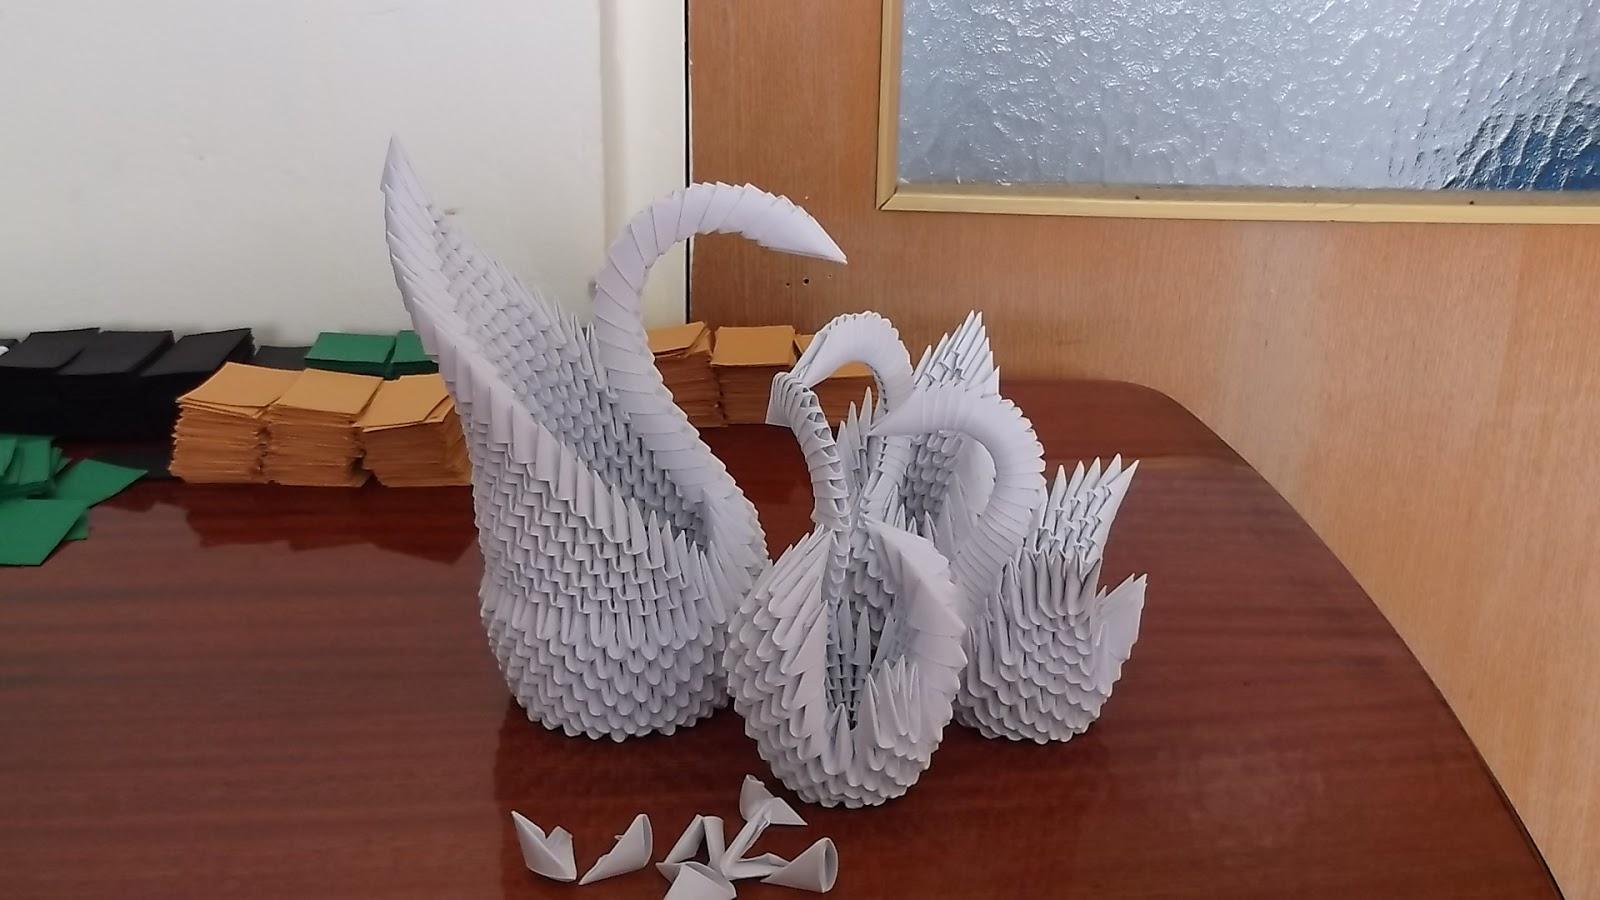 Razcapapercraft: 3D Origami swan family - photo#48